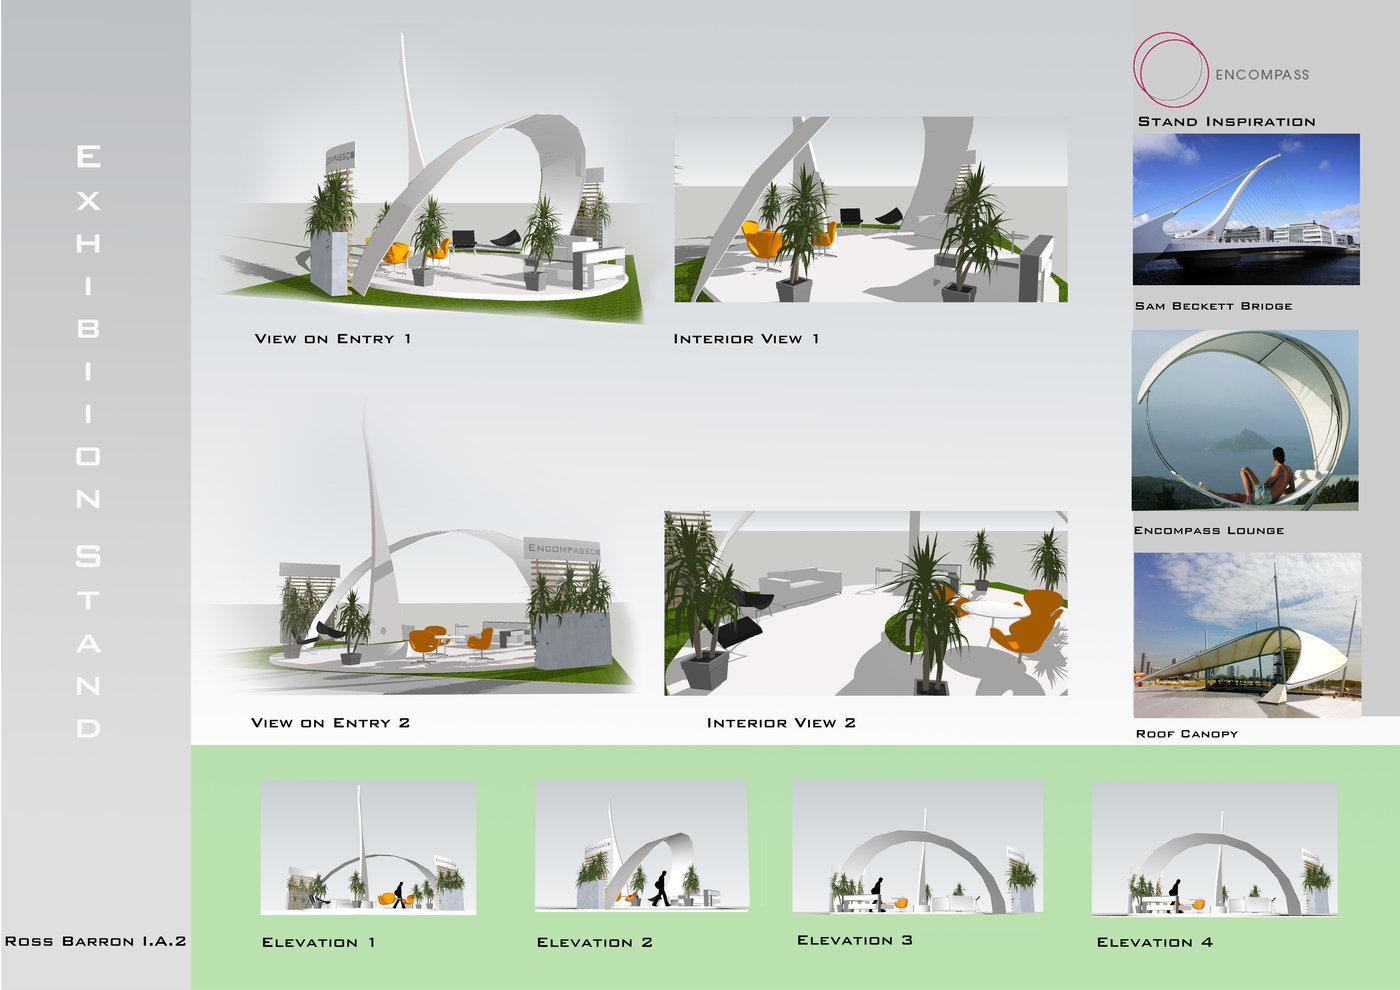 Exhibition Stand Design Presentation : Presentation boards by ross barron at coroflot